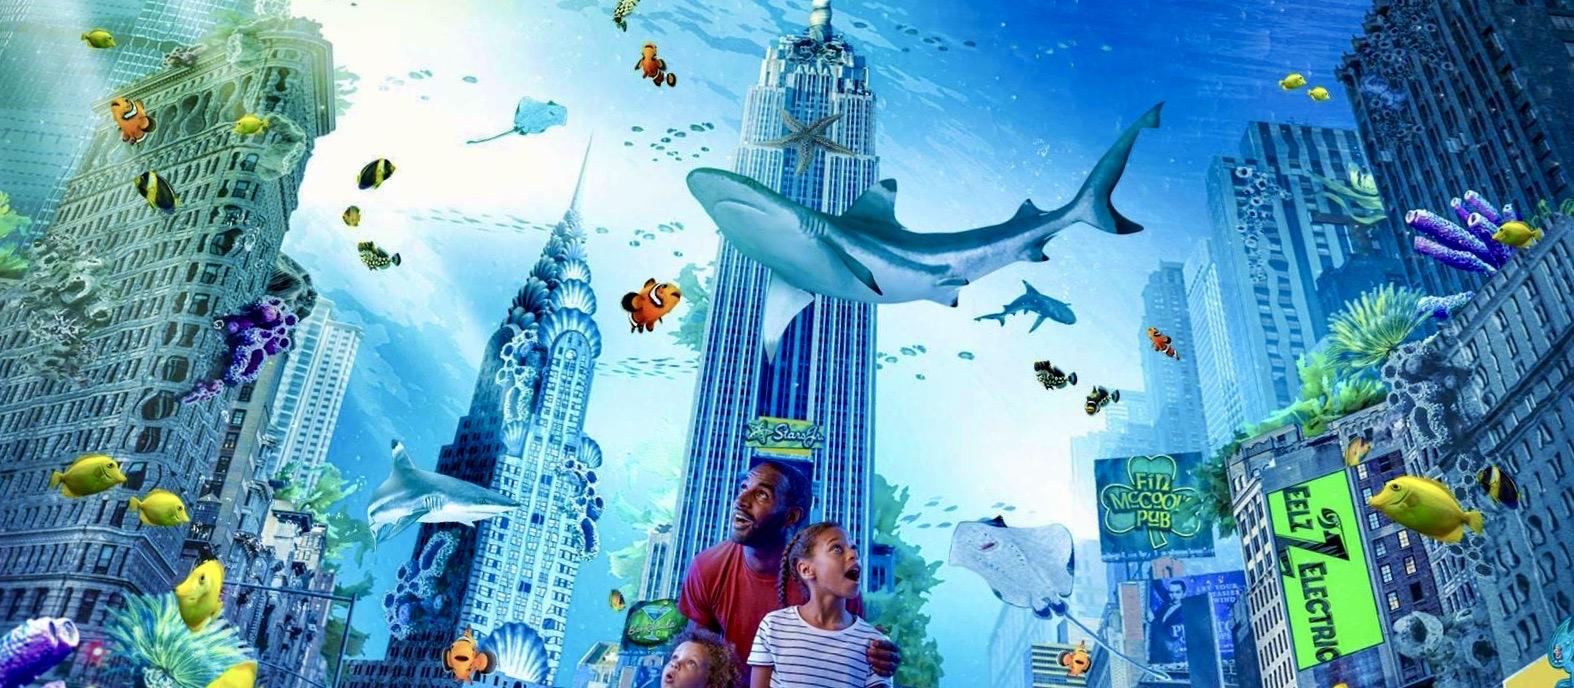 Sea Life Aquarium New Jersey, City Under the Sea, American Dream